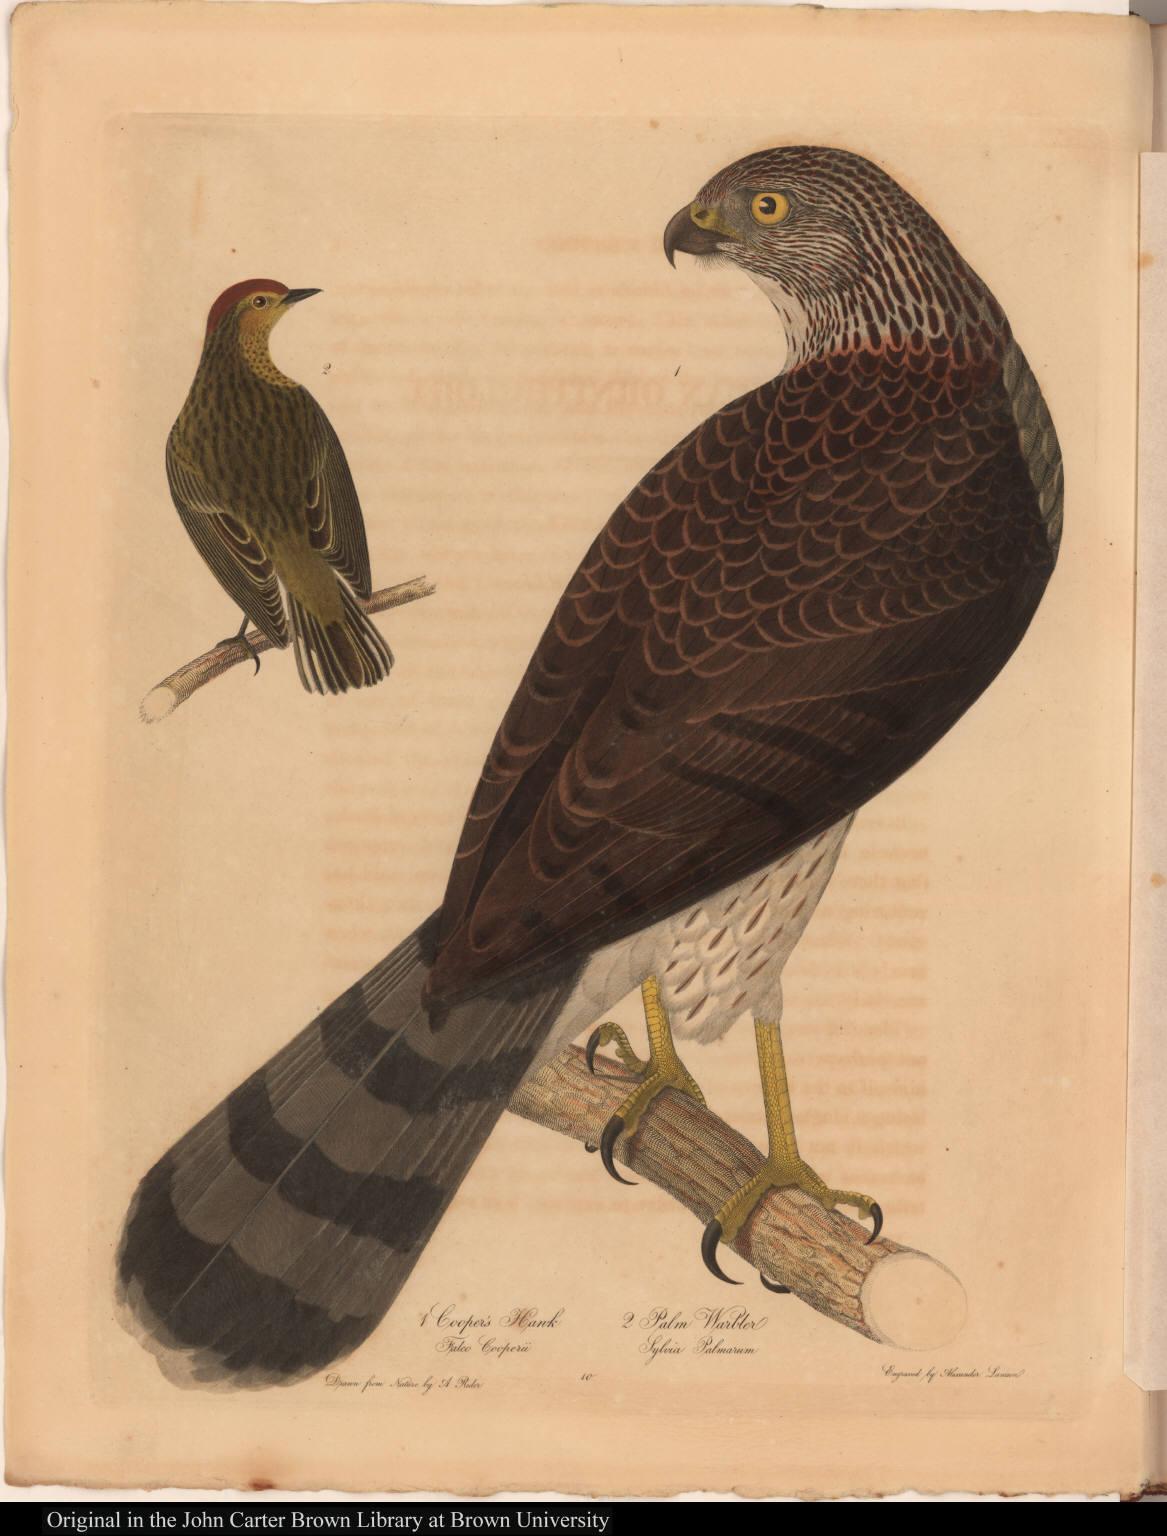 1 Cooper's Hawk Falco Cooperii 2 Palm Warbler Sylvia Palmarum